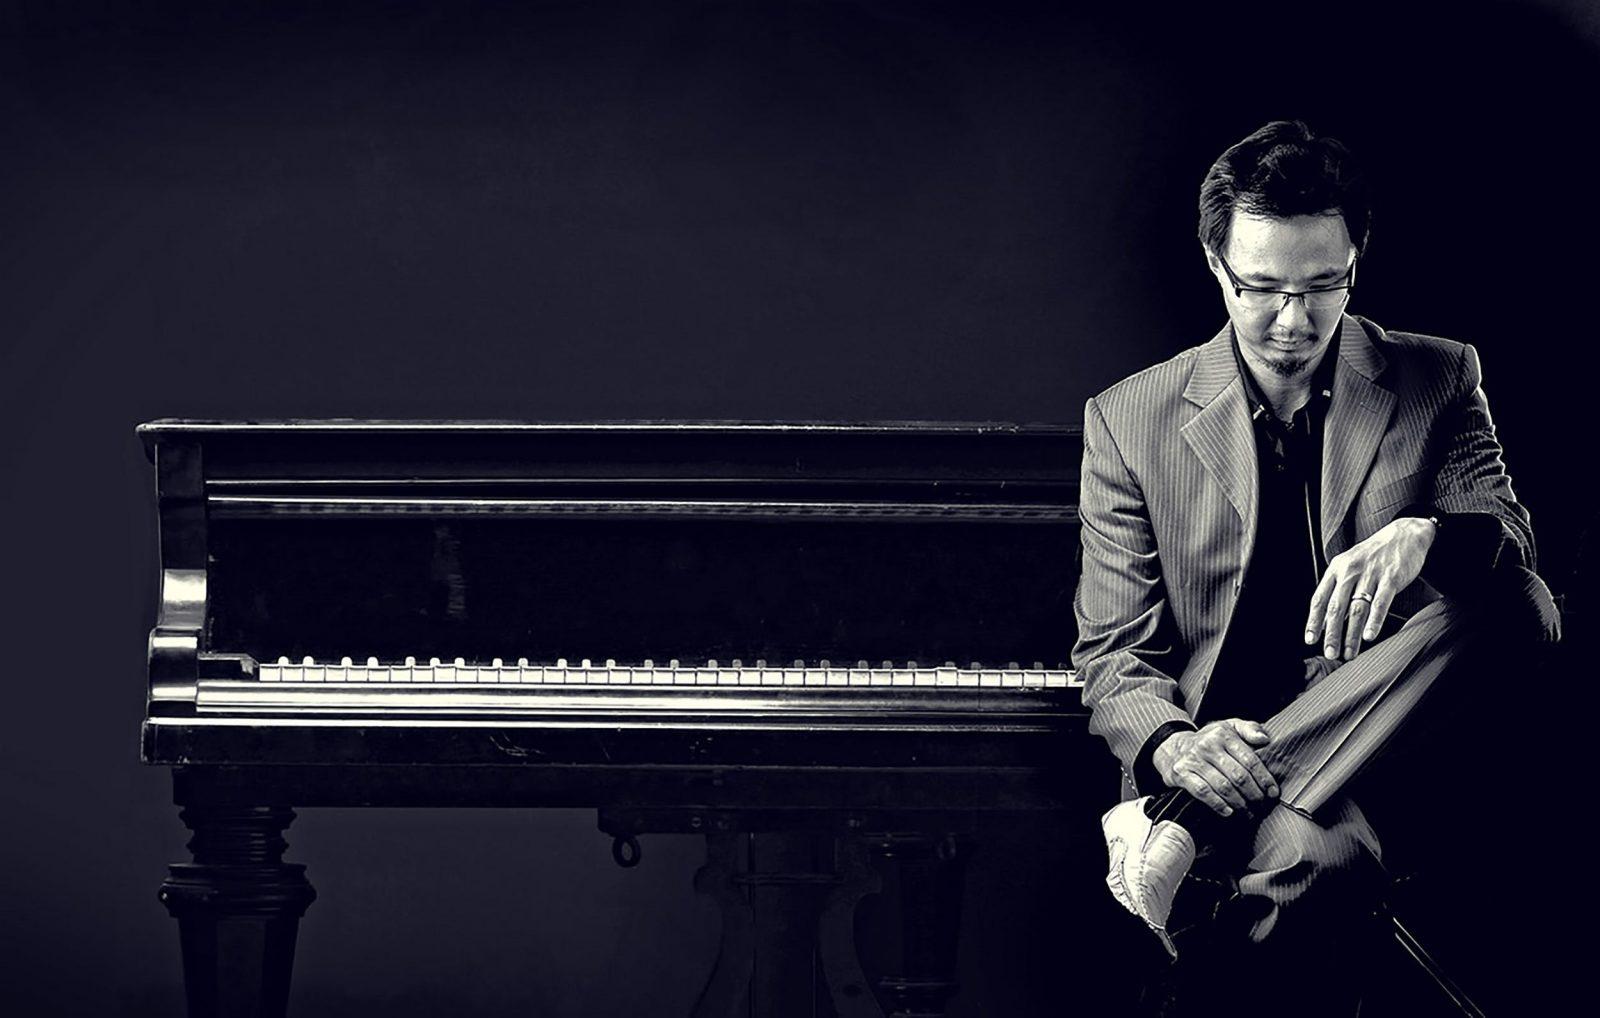 Terence Koo concert on the Gartelmann Deck